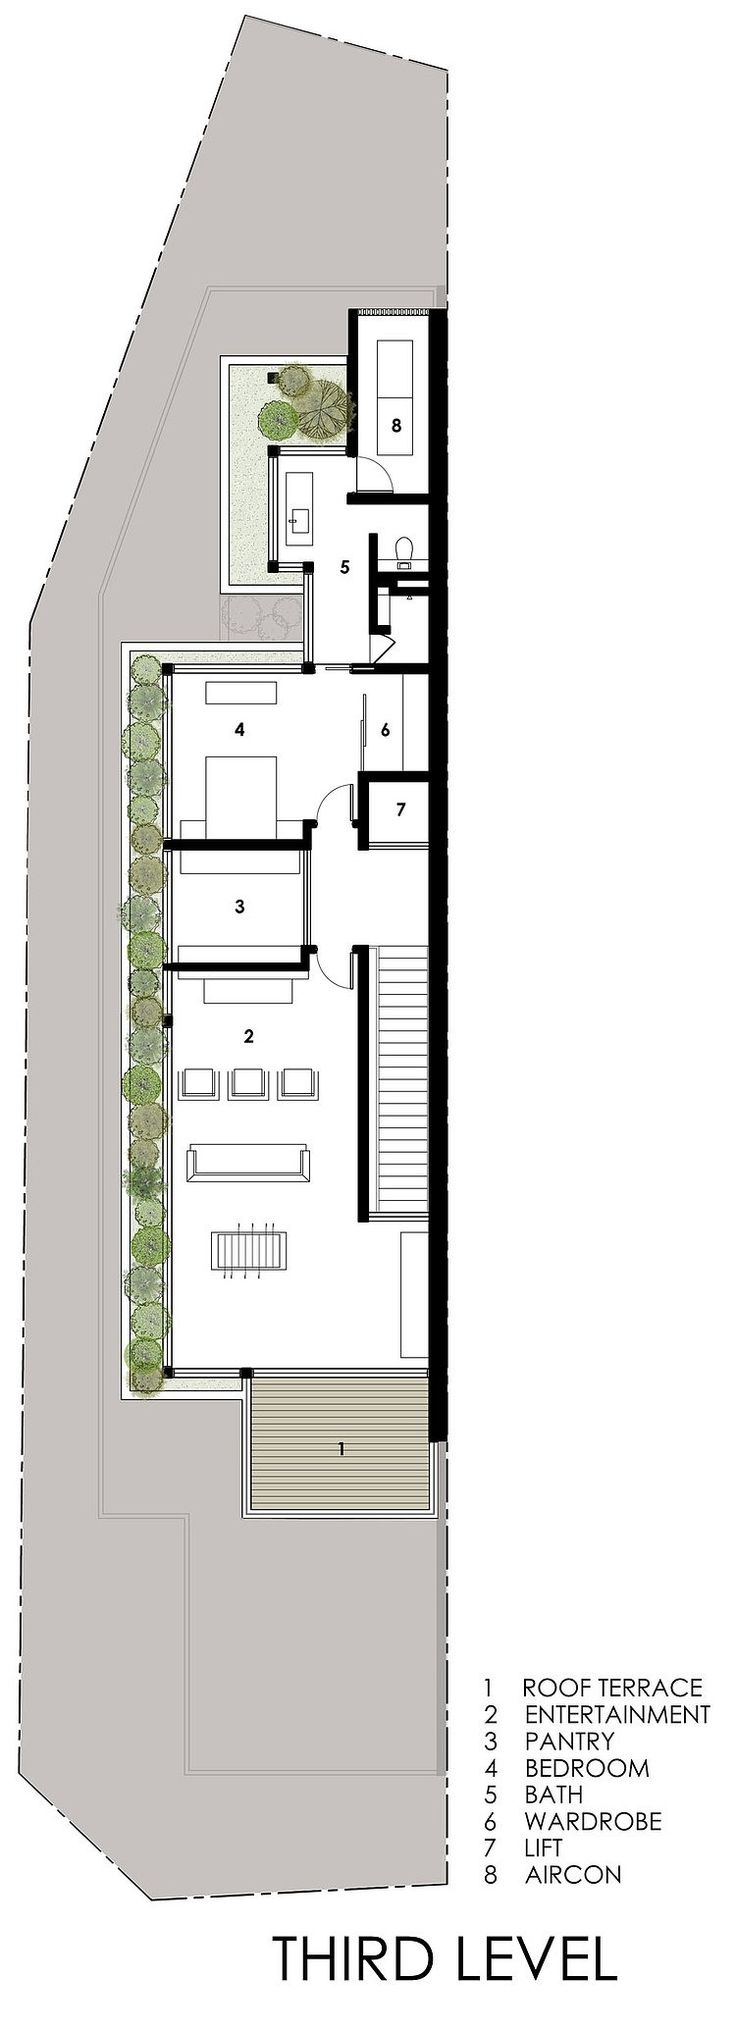 Architecture Design Plans 284 best floor plan images on pinterest | floor plans, small